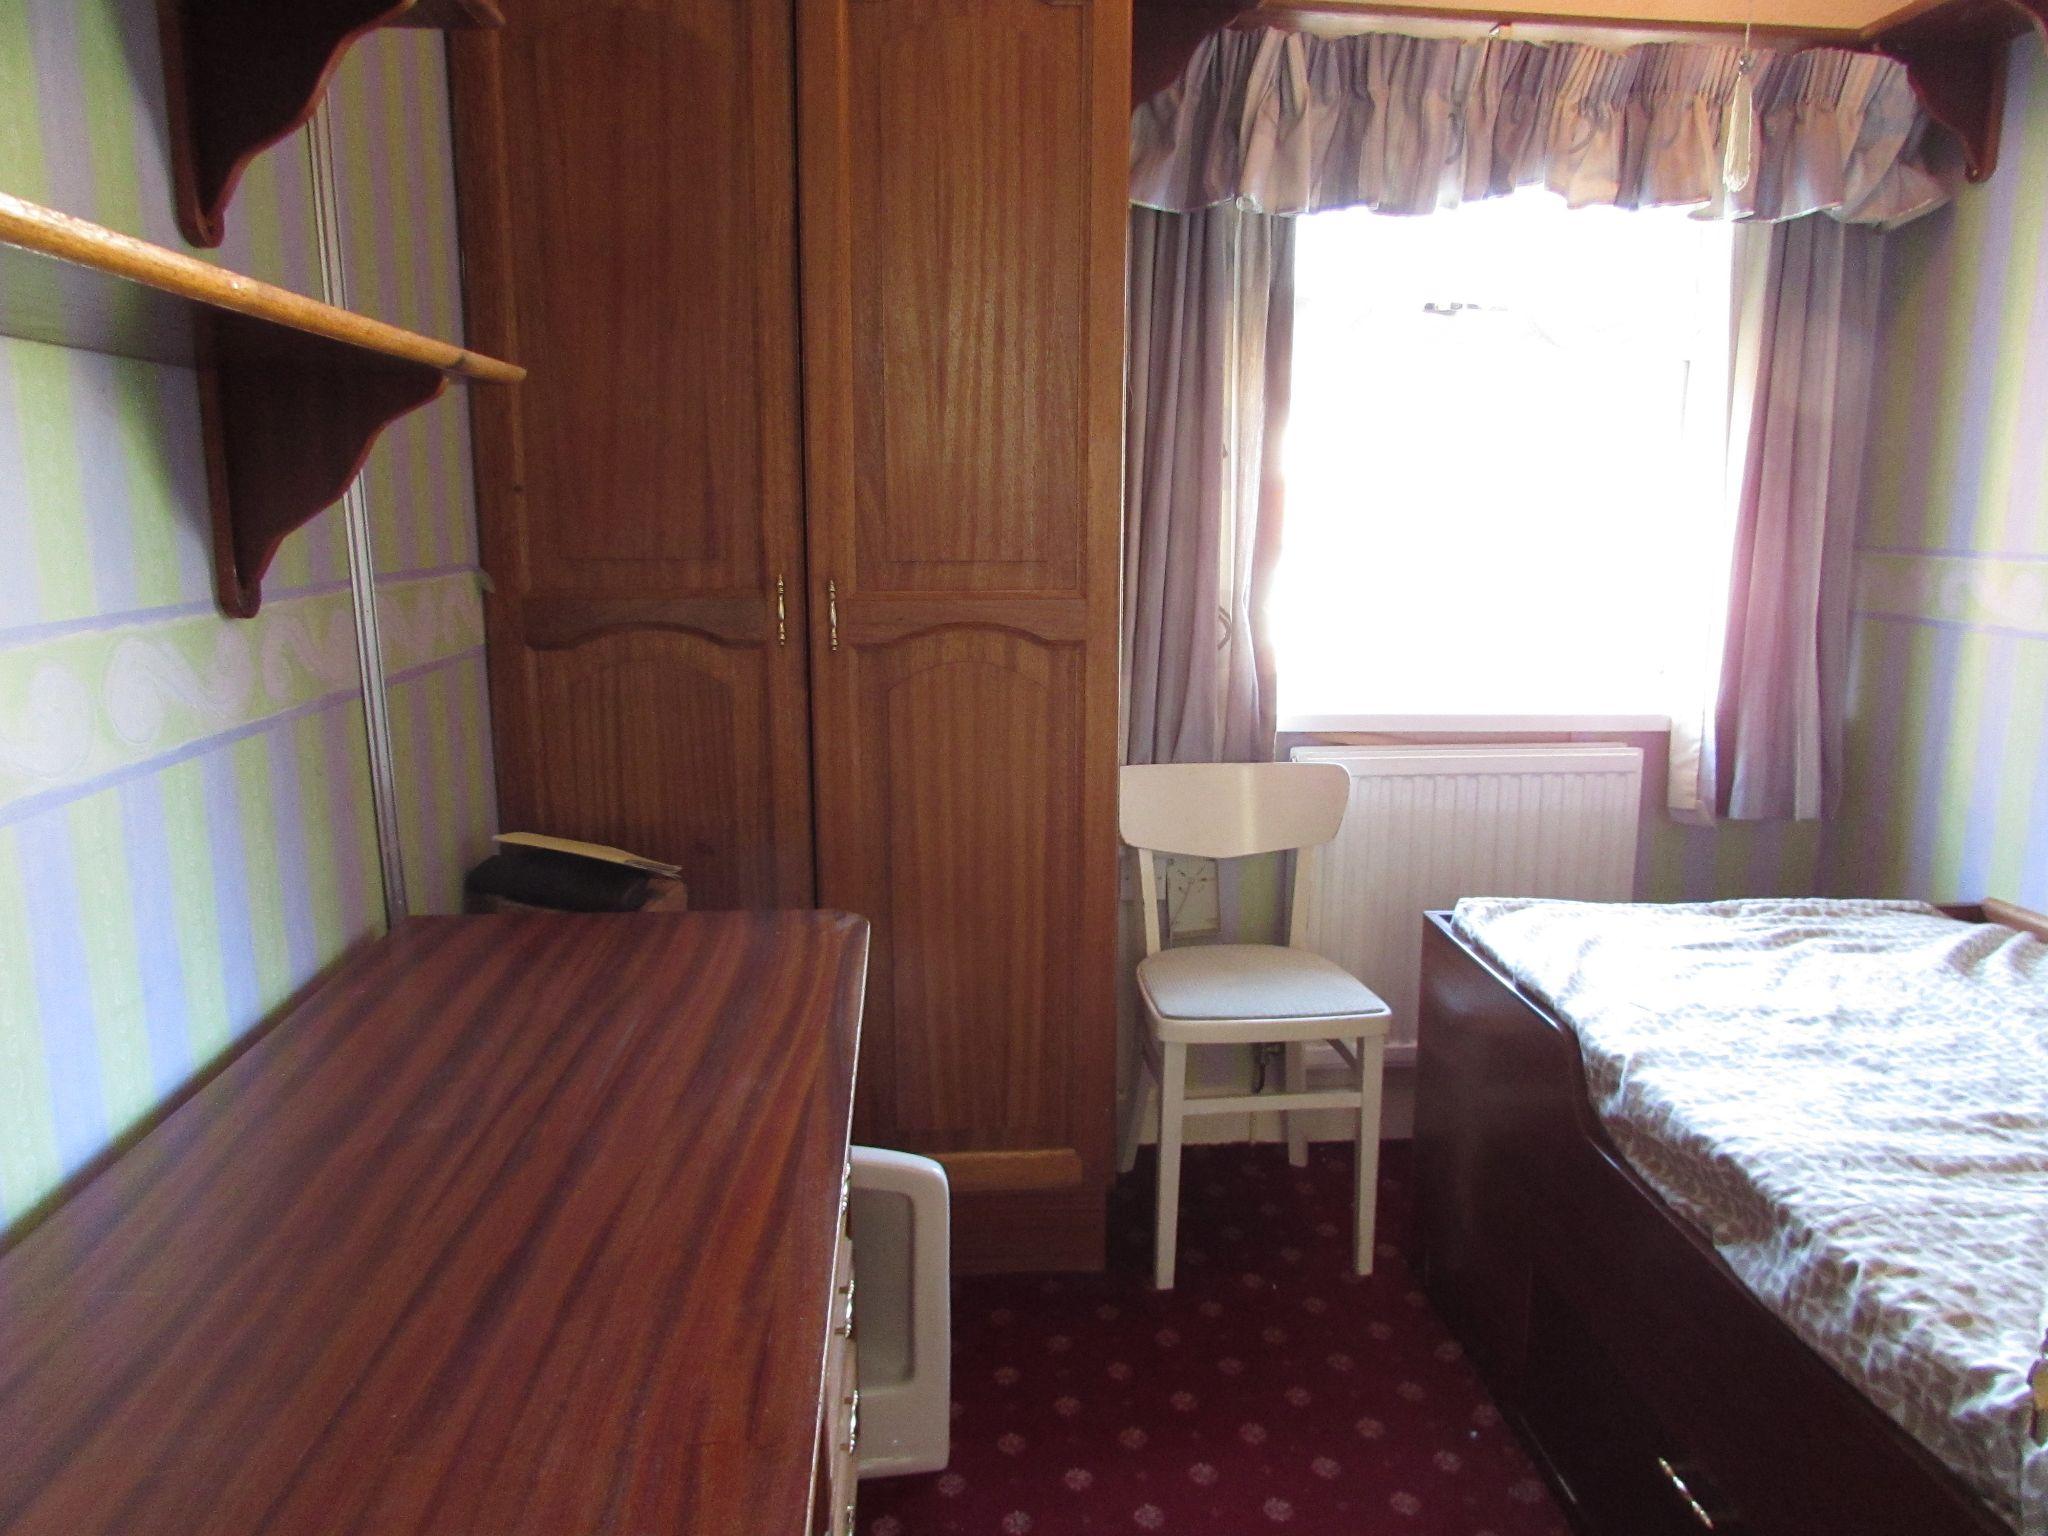 3 Bedroom Semi-detached House For Sale - Bedroom 3